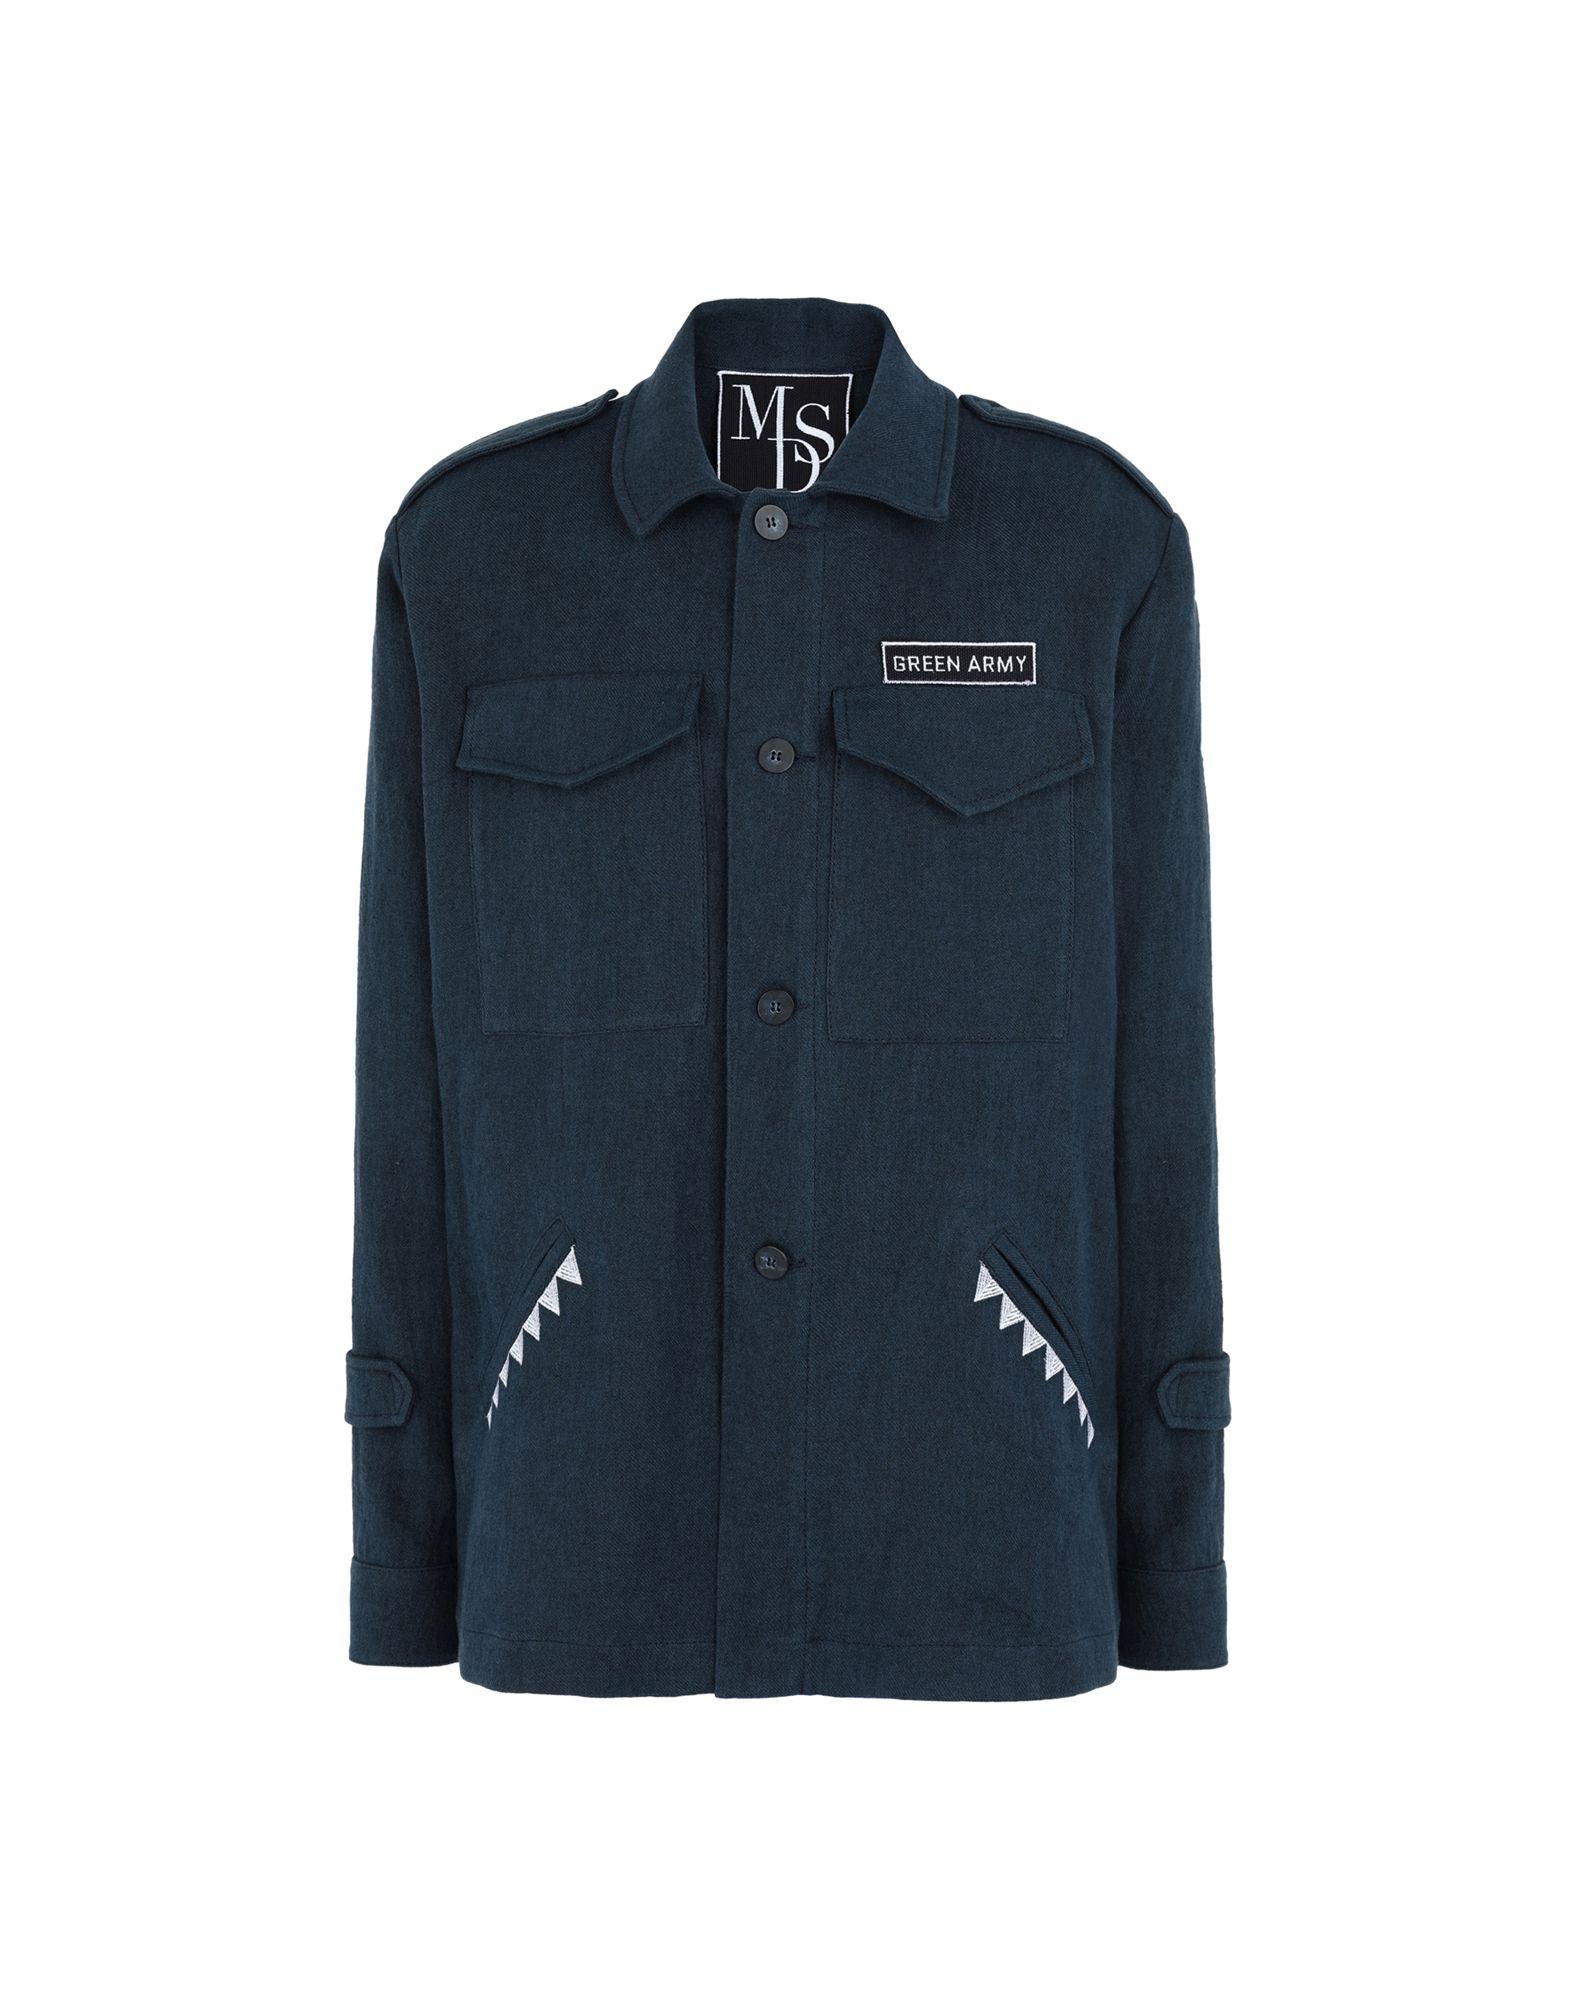 MDS GREEN ARMY Куртка